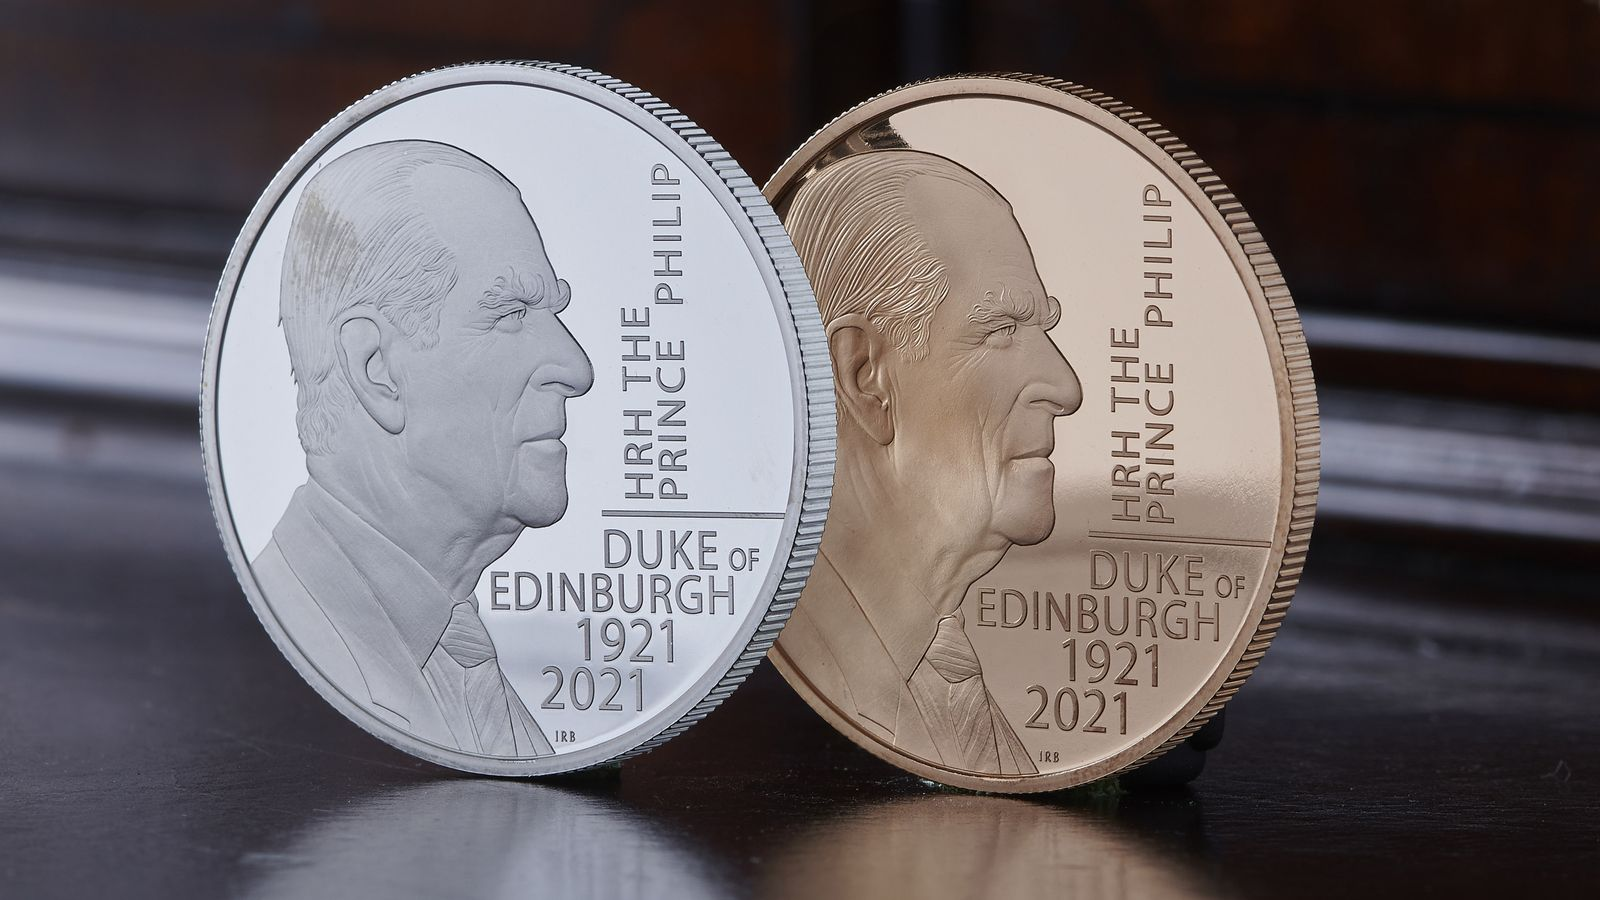 Prince Philip: New £5 Coin Released To Commemorate Duke Of Edinburgh